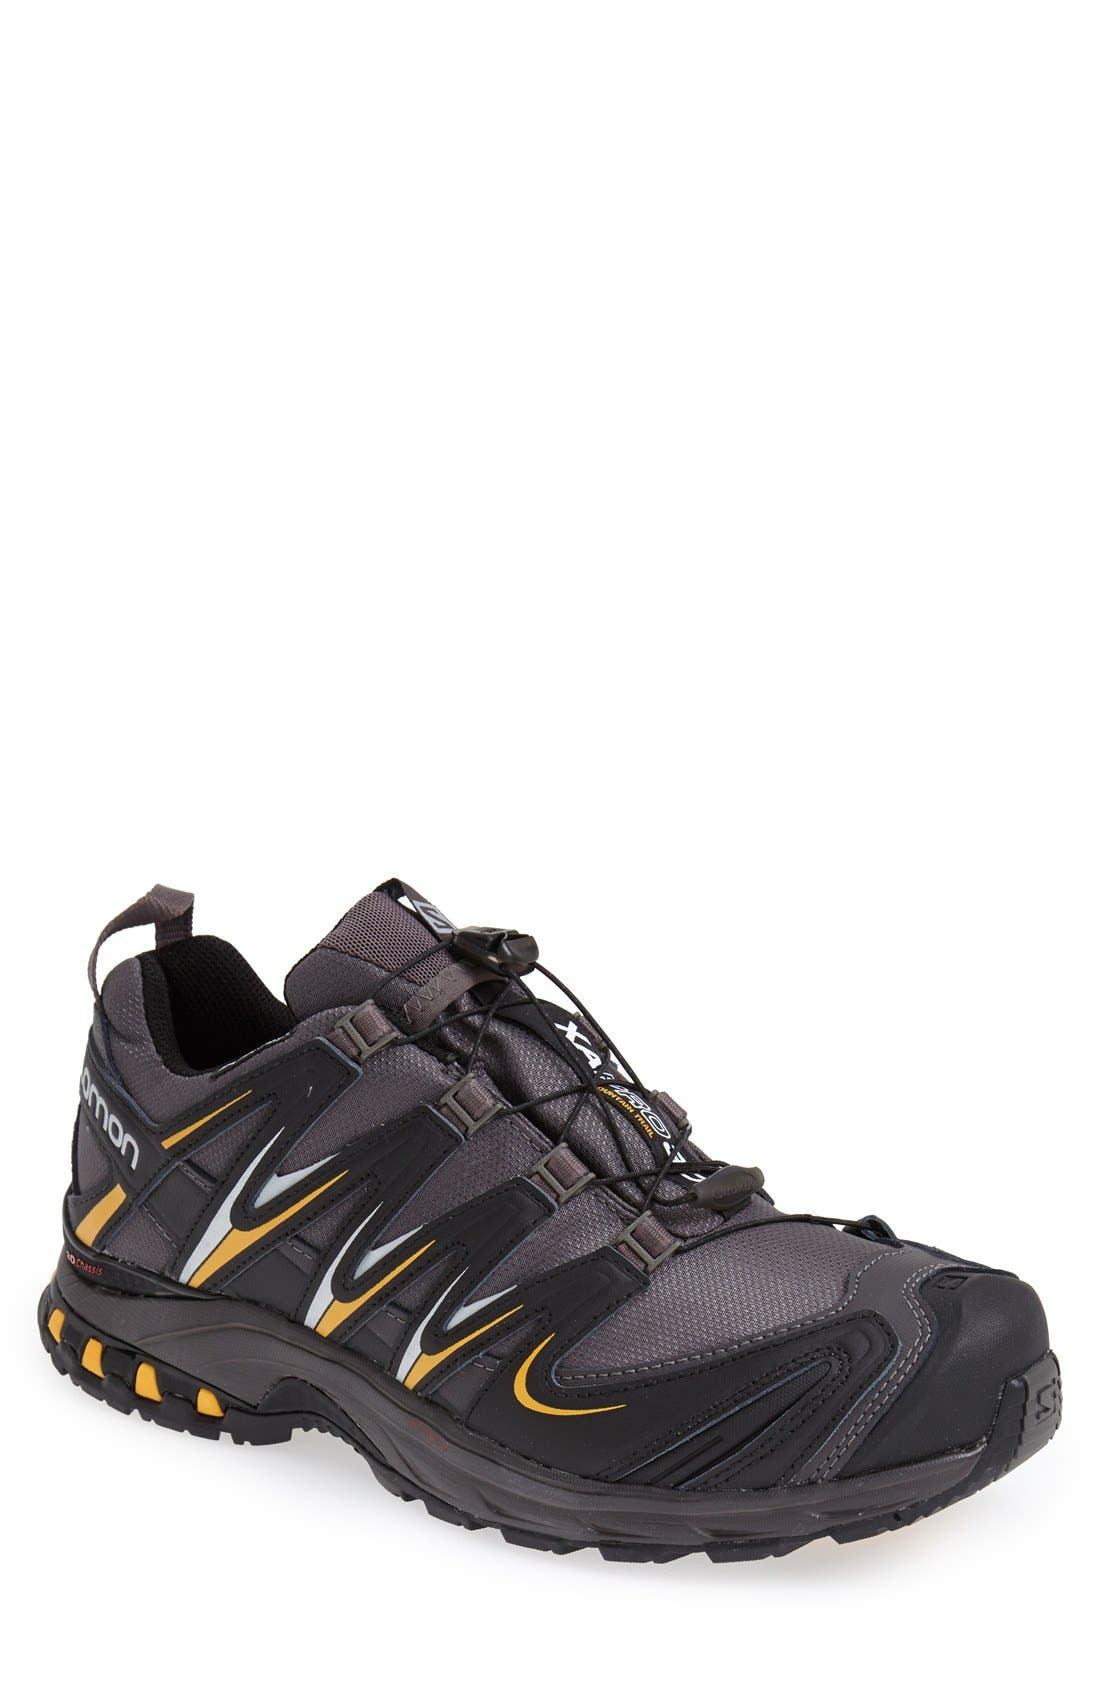 Main Image - Salomon 'XA Pro 3D Ultra CS WP' Trail Running Shoe (Men)